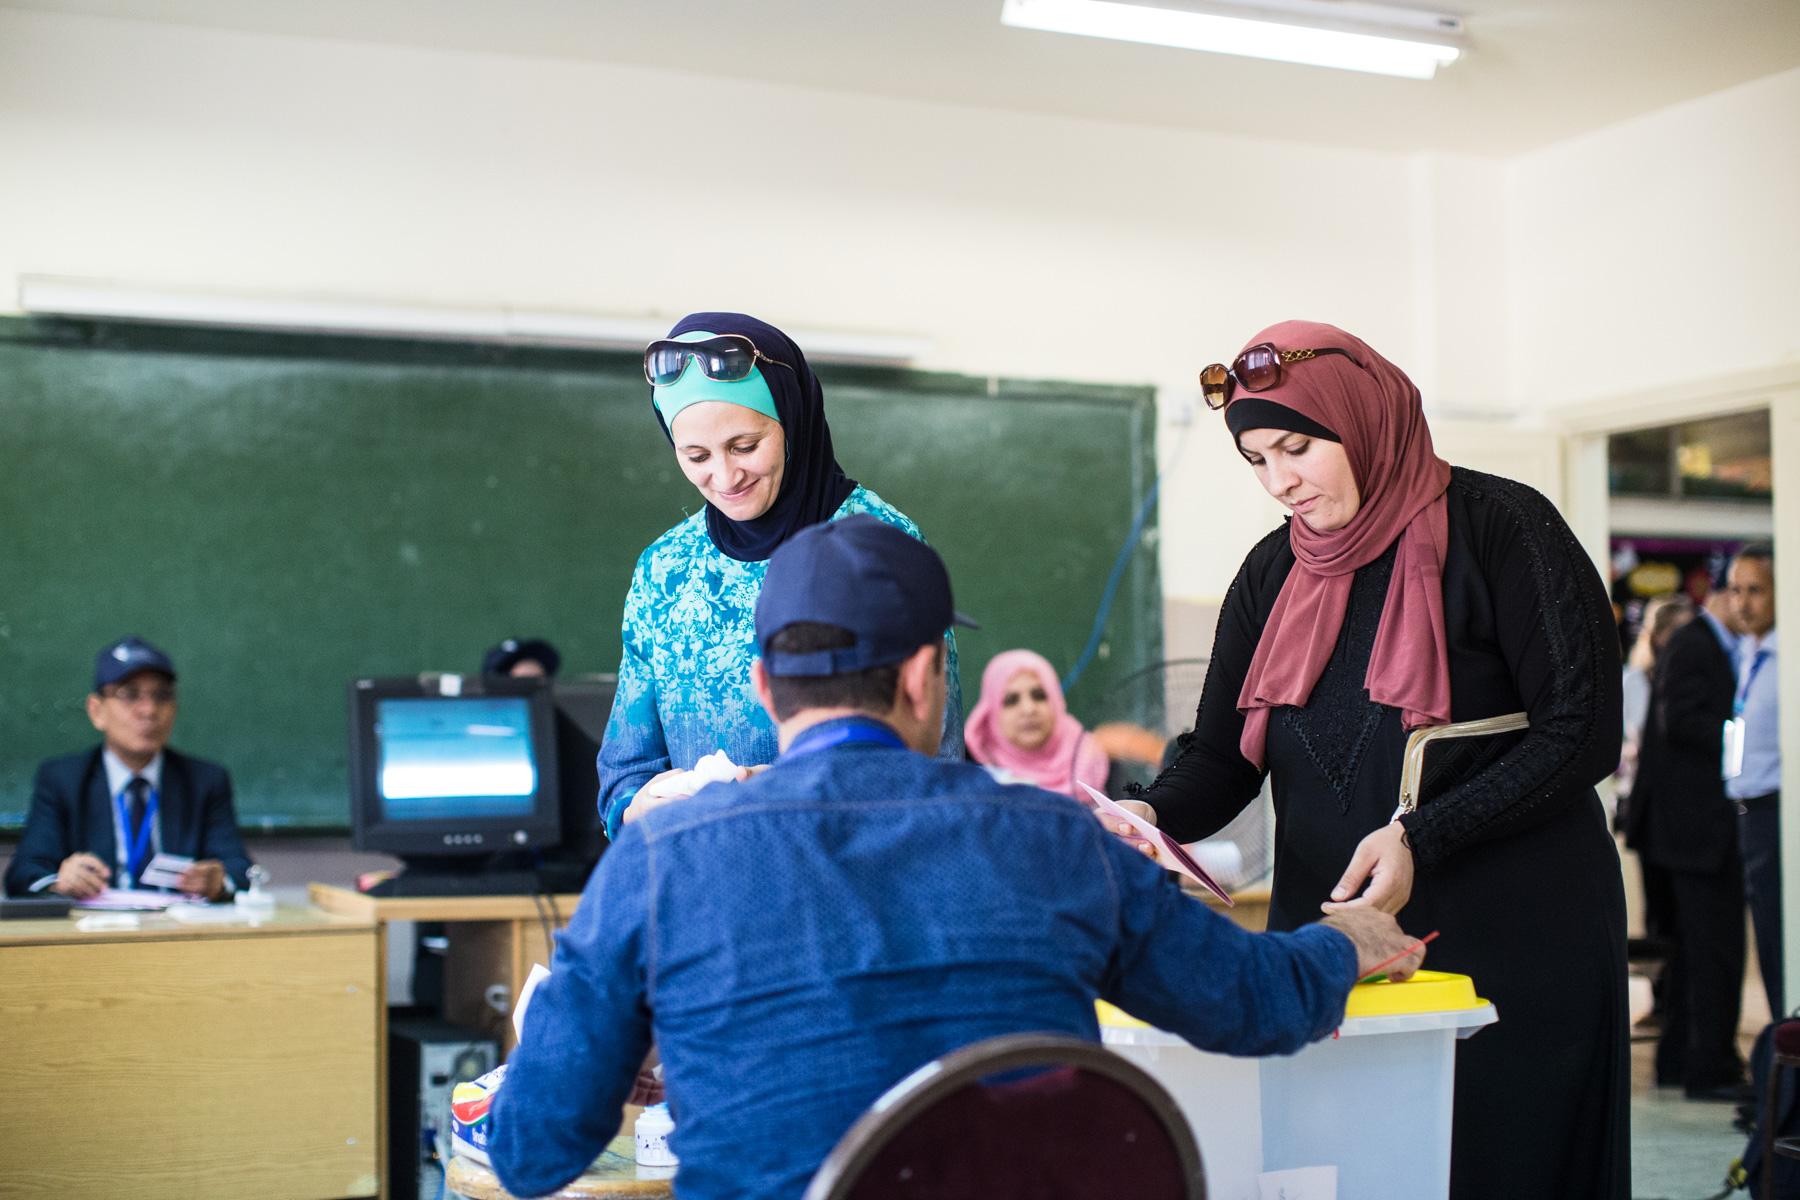 Women cast their ballots in Jordan's general elections on Sept. 20, 2016, in Amman, Jordan.